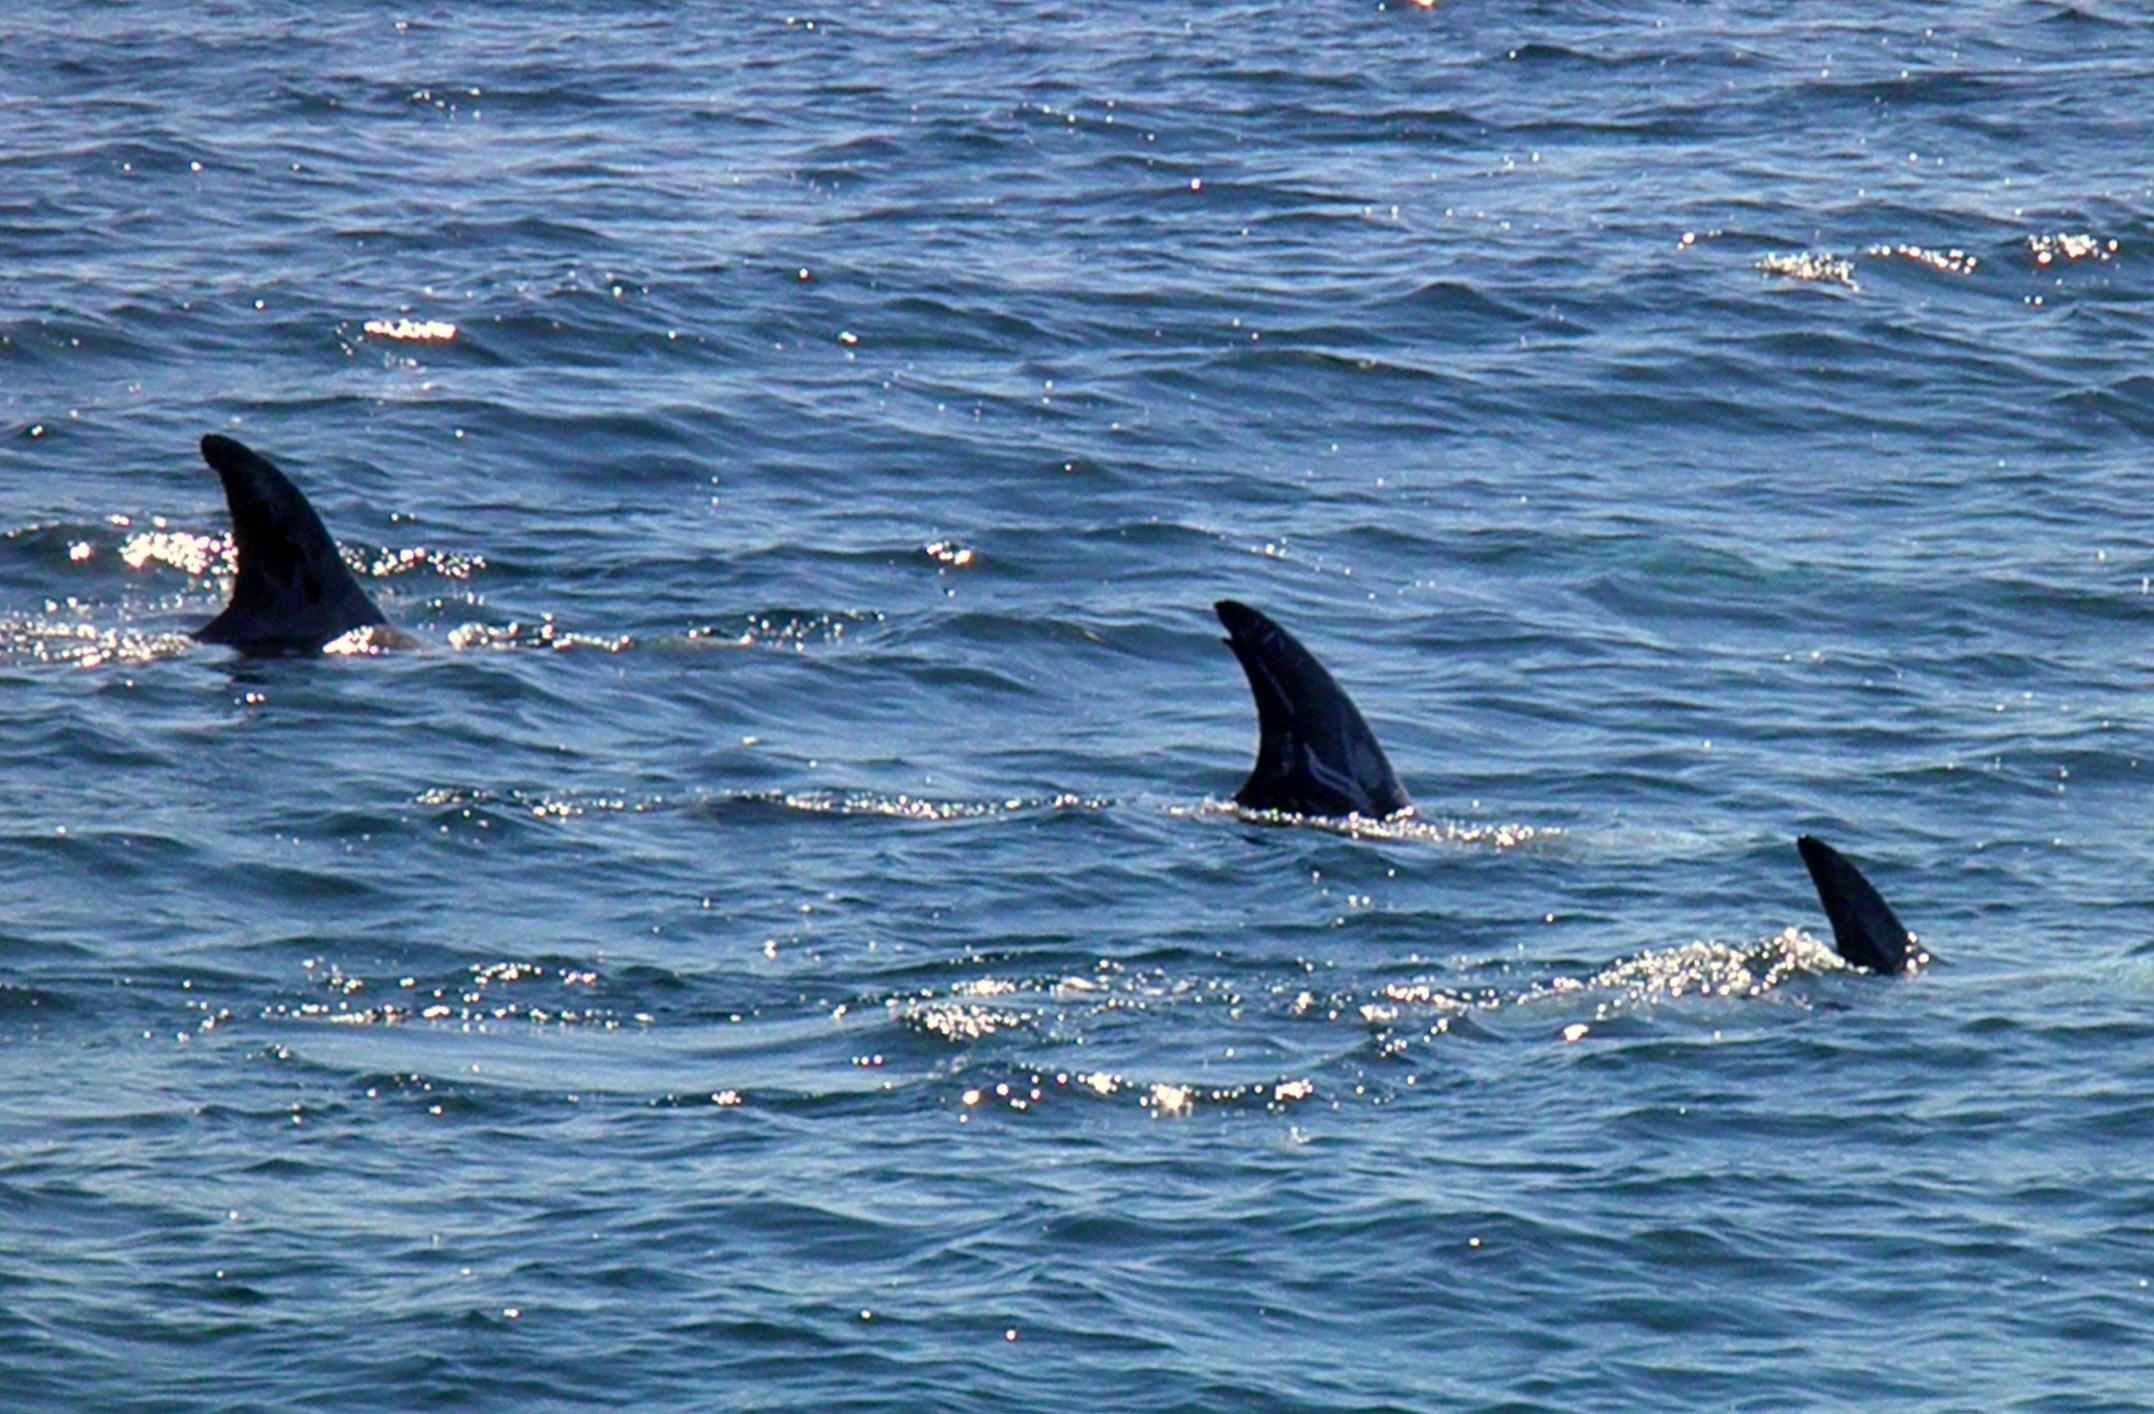 Dolphin fin